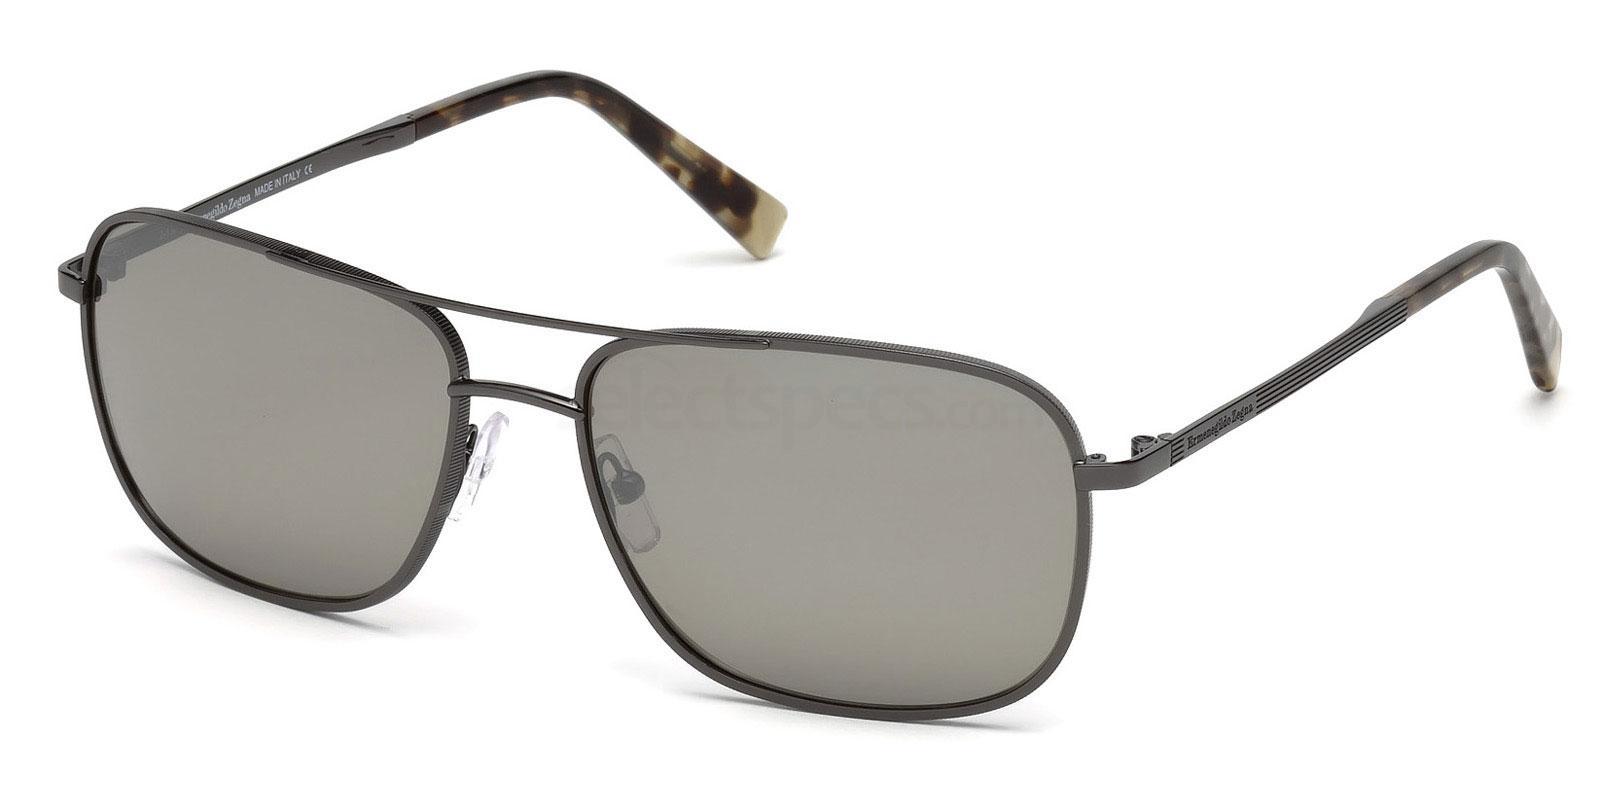 08C EZ0079 Sunglasses, Ermenegildo Zegna